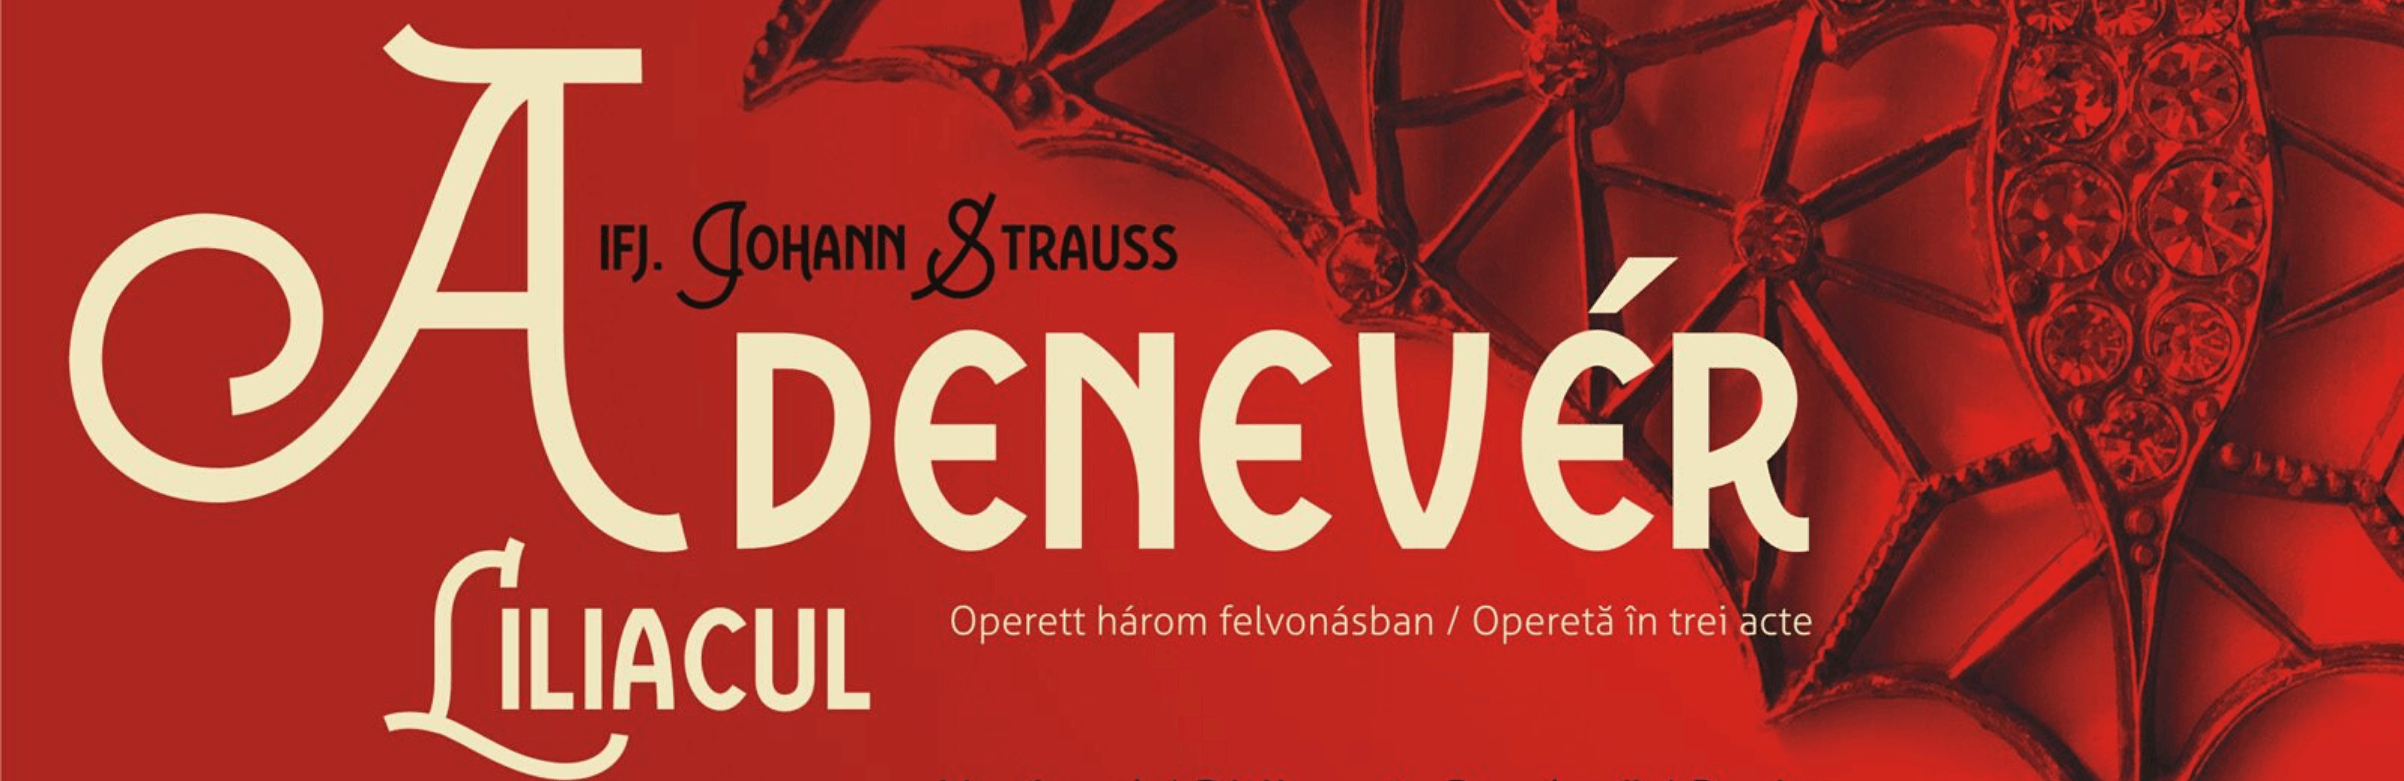 liliacul opera maghiara cluj